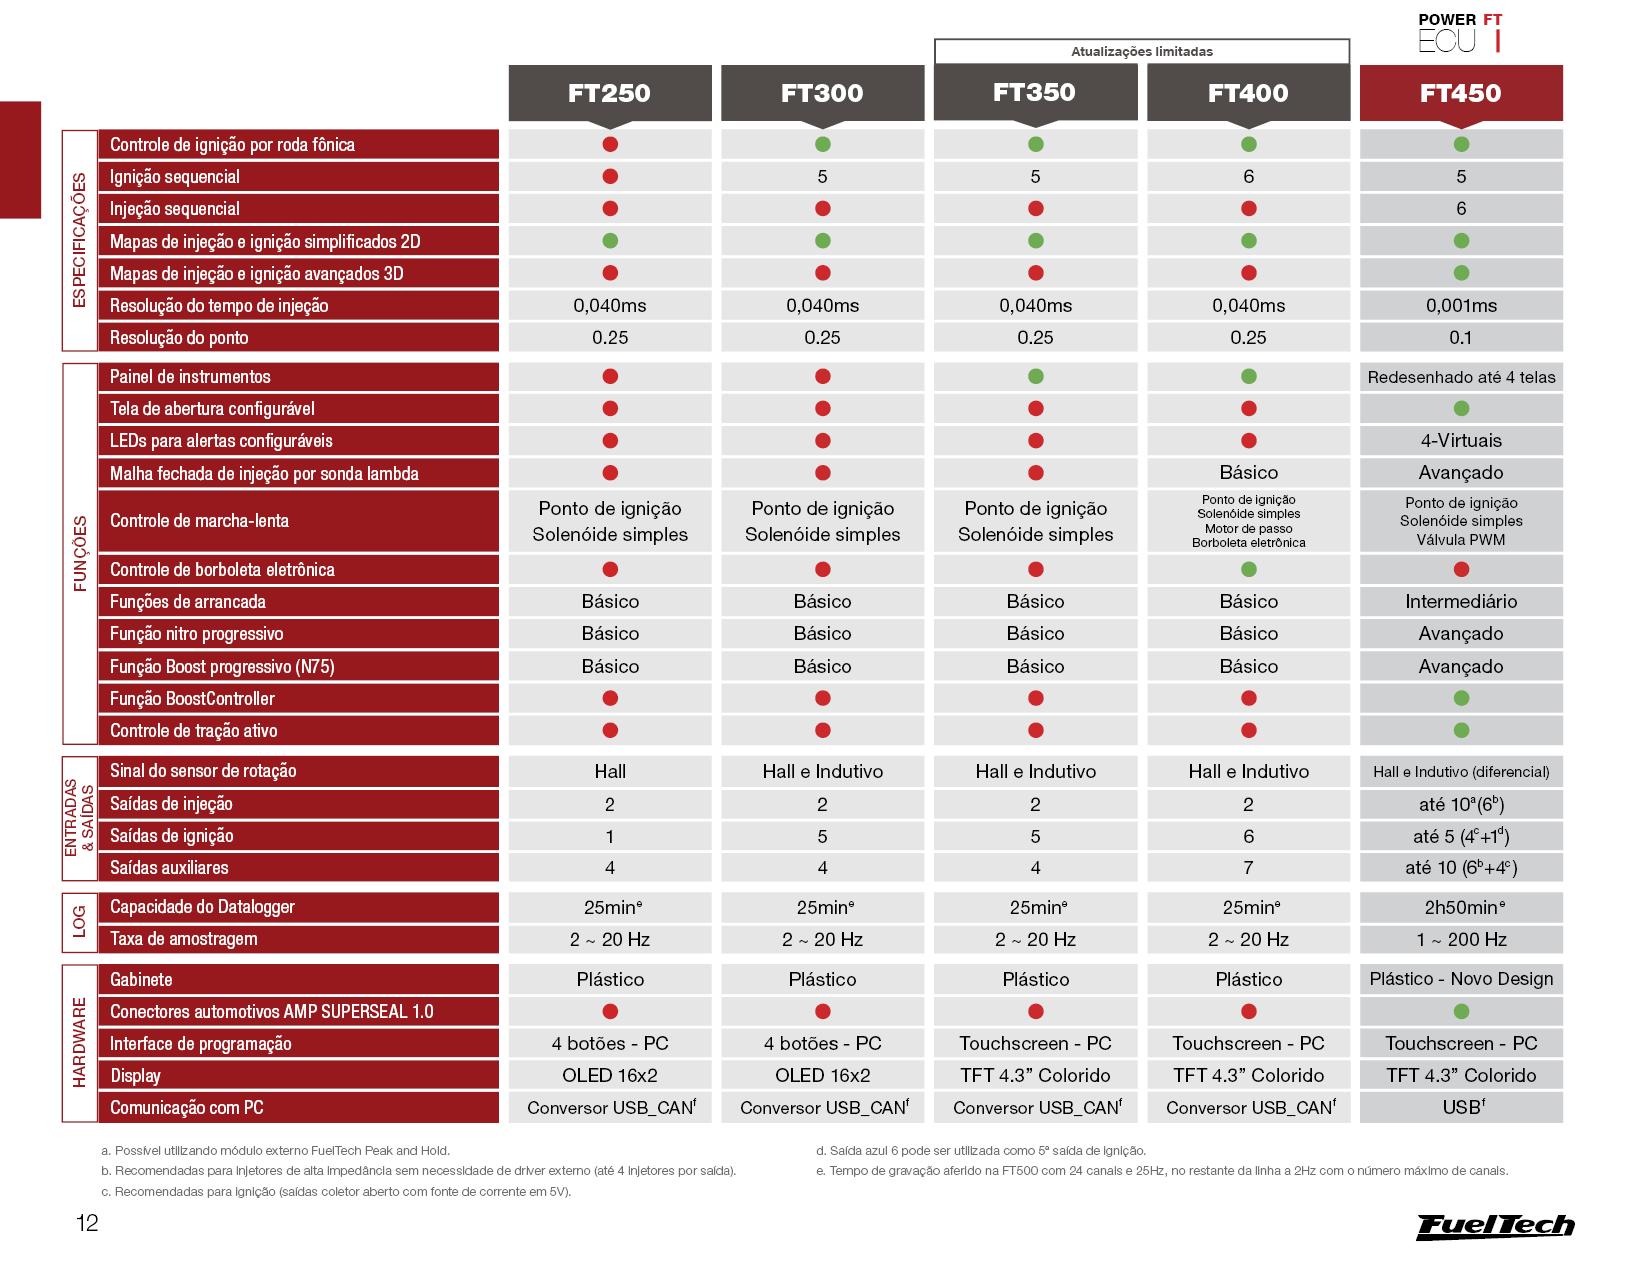 fuel-tech-tabela-1.png